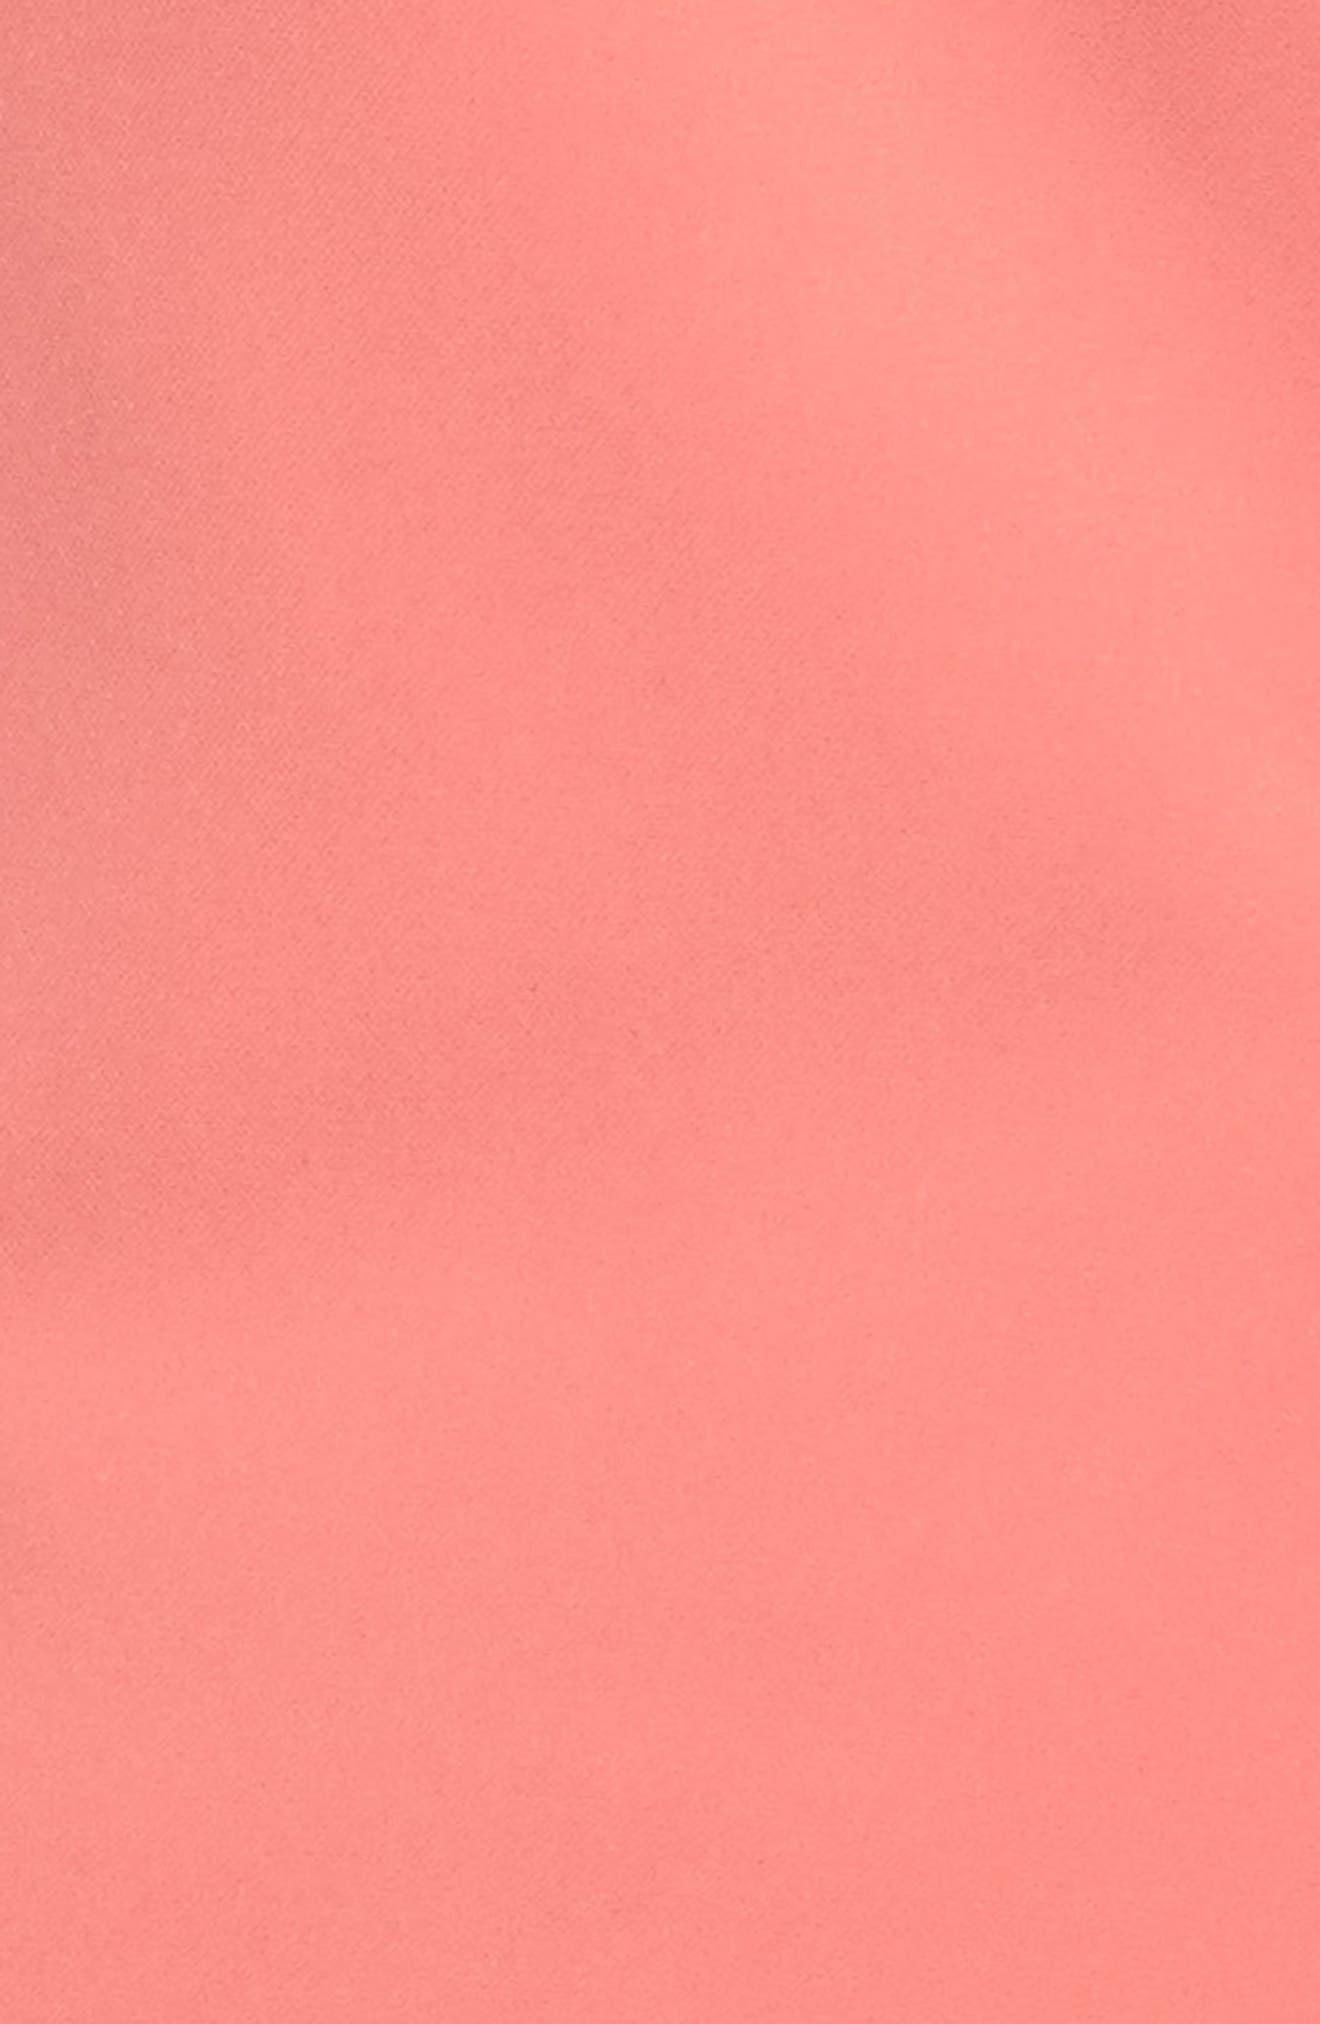 Boyfriend Blazer,                             Alternate thumbnail 7, color,                             950